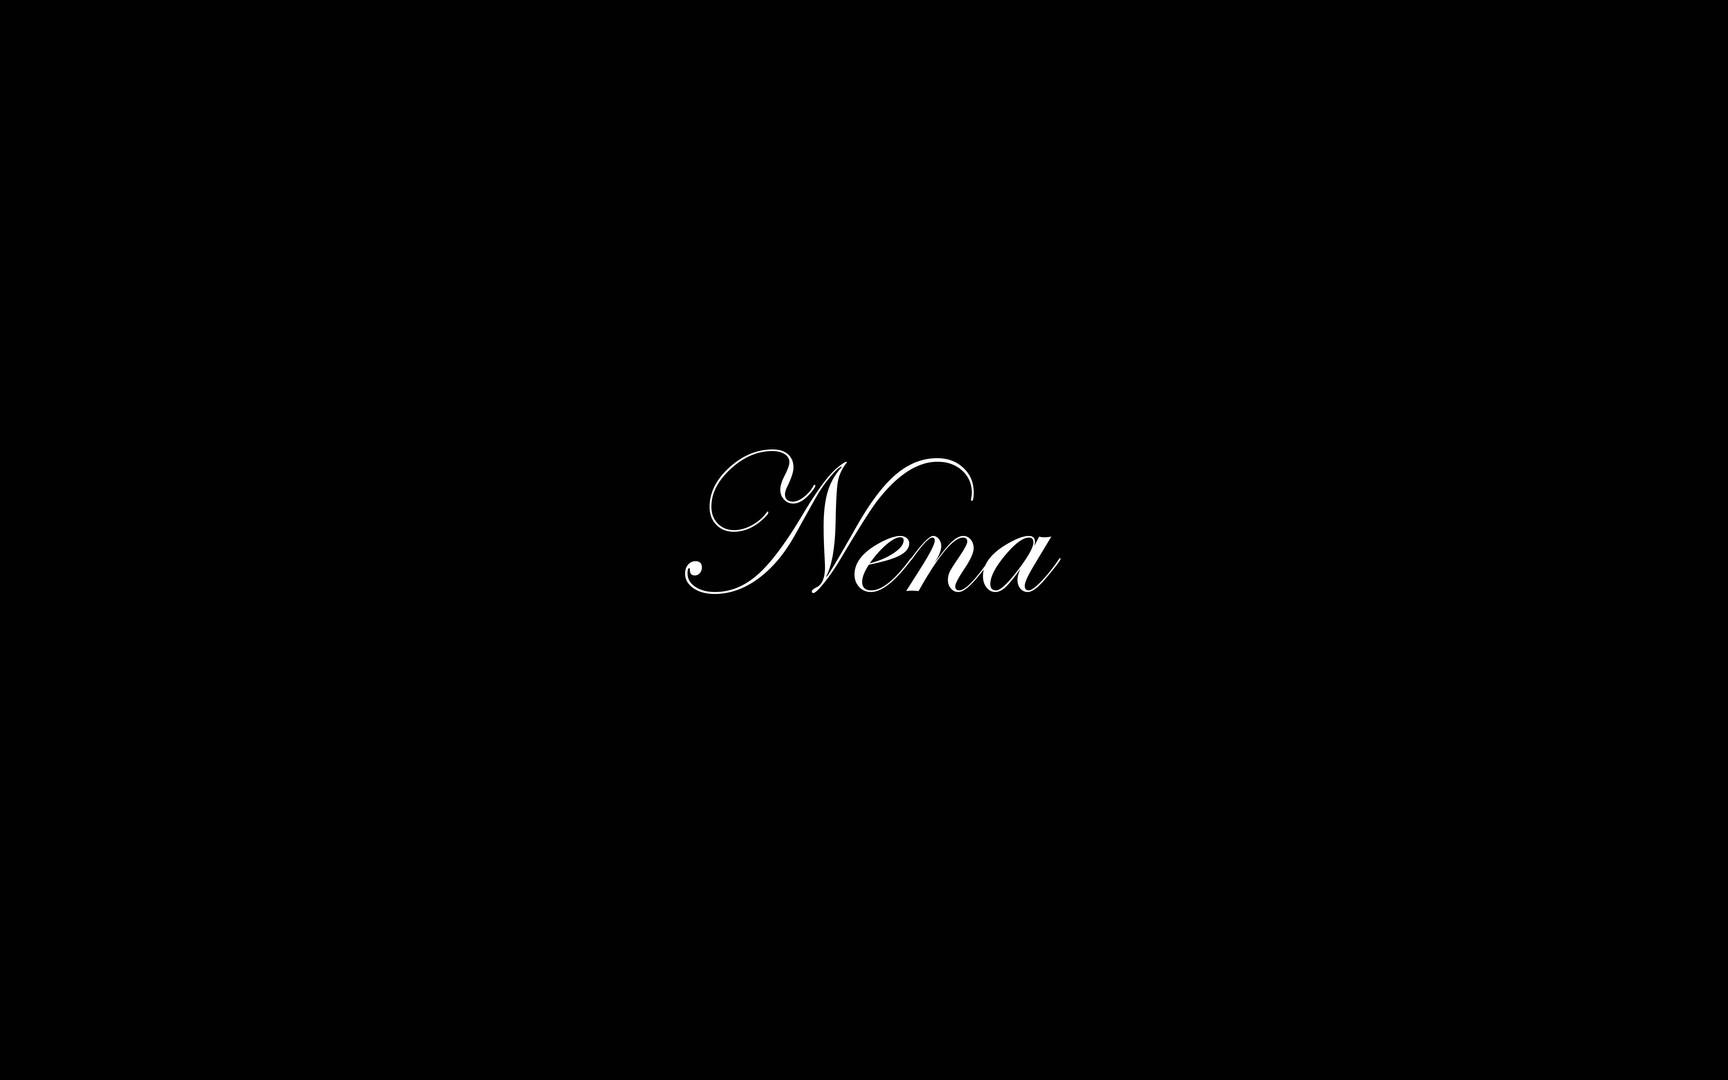 Nena-1.jpg